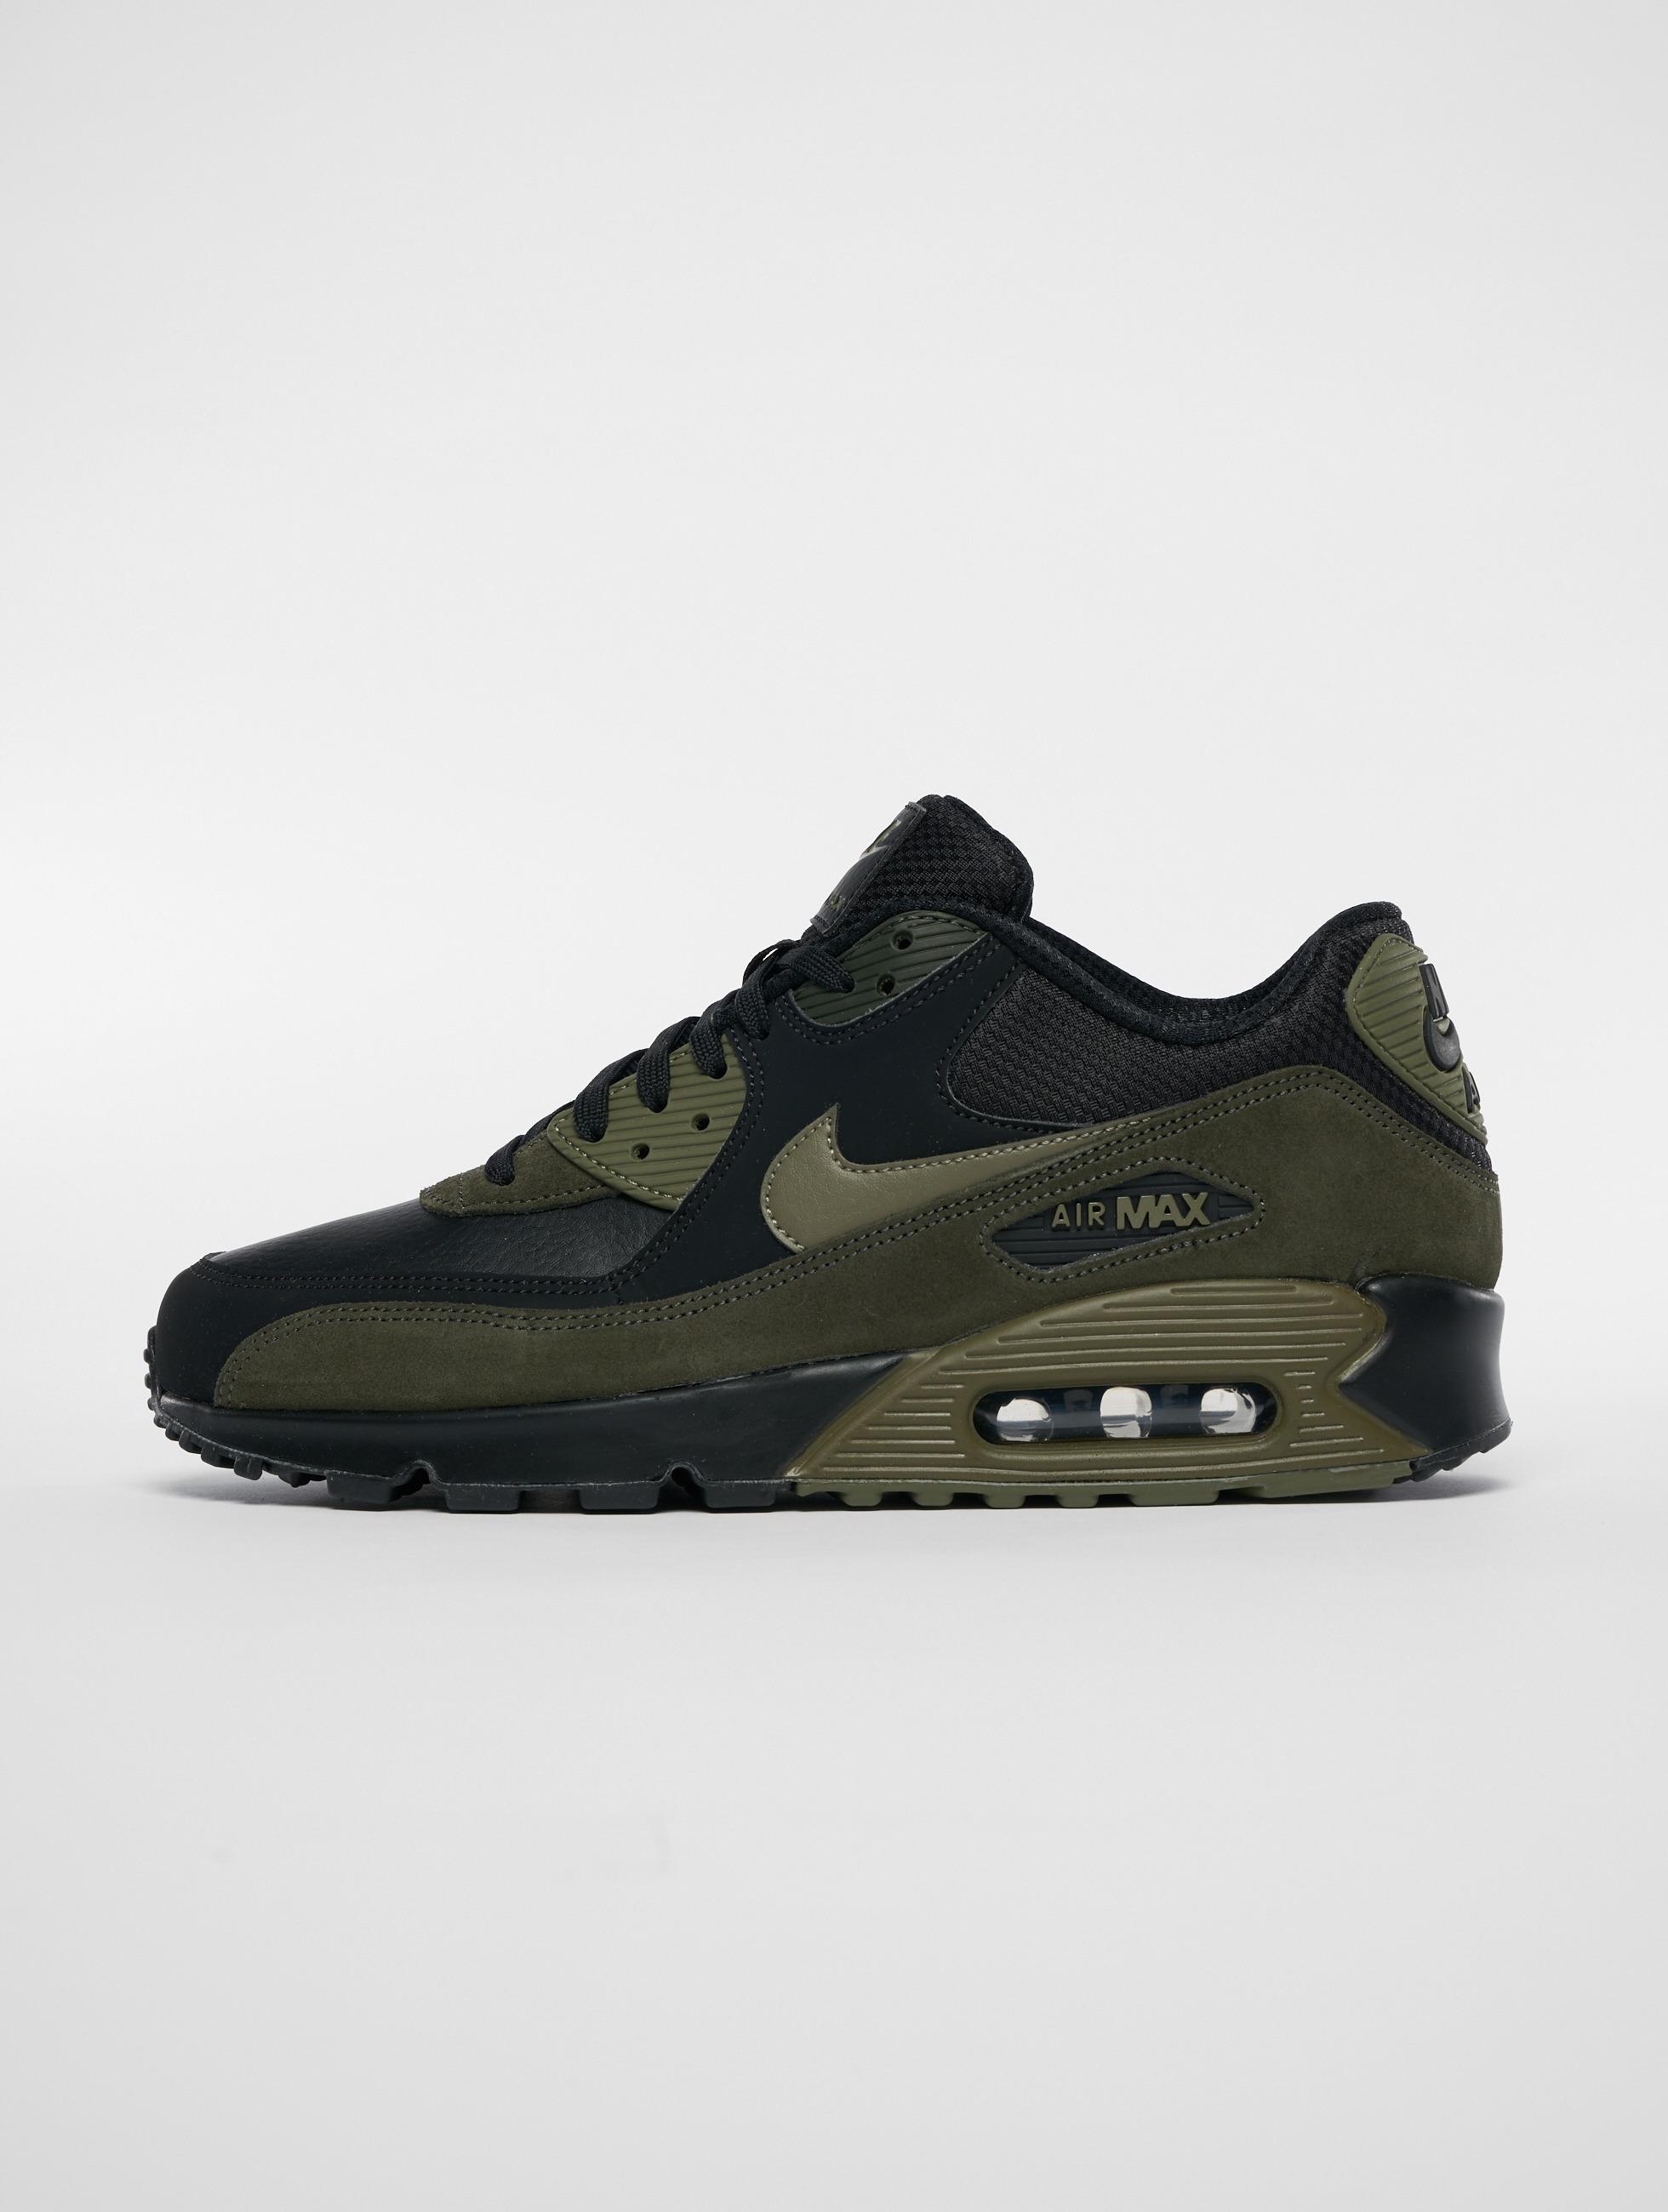 free shipping 38734 4e589 Nike Skor   Sneakers Air Max 90 Leather i svart 499226